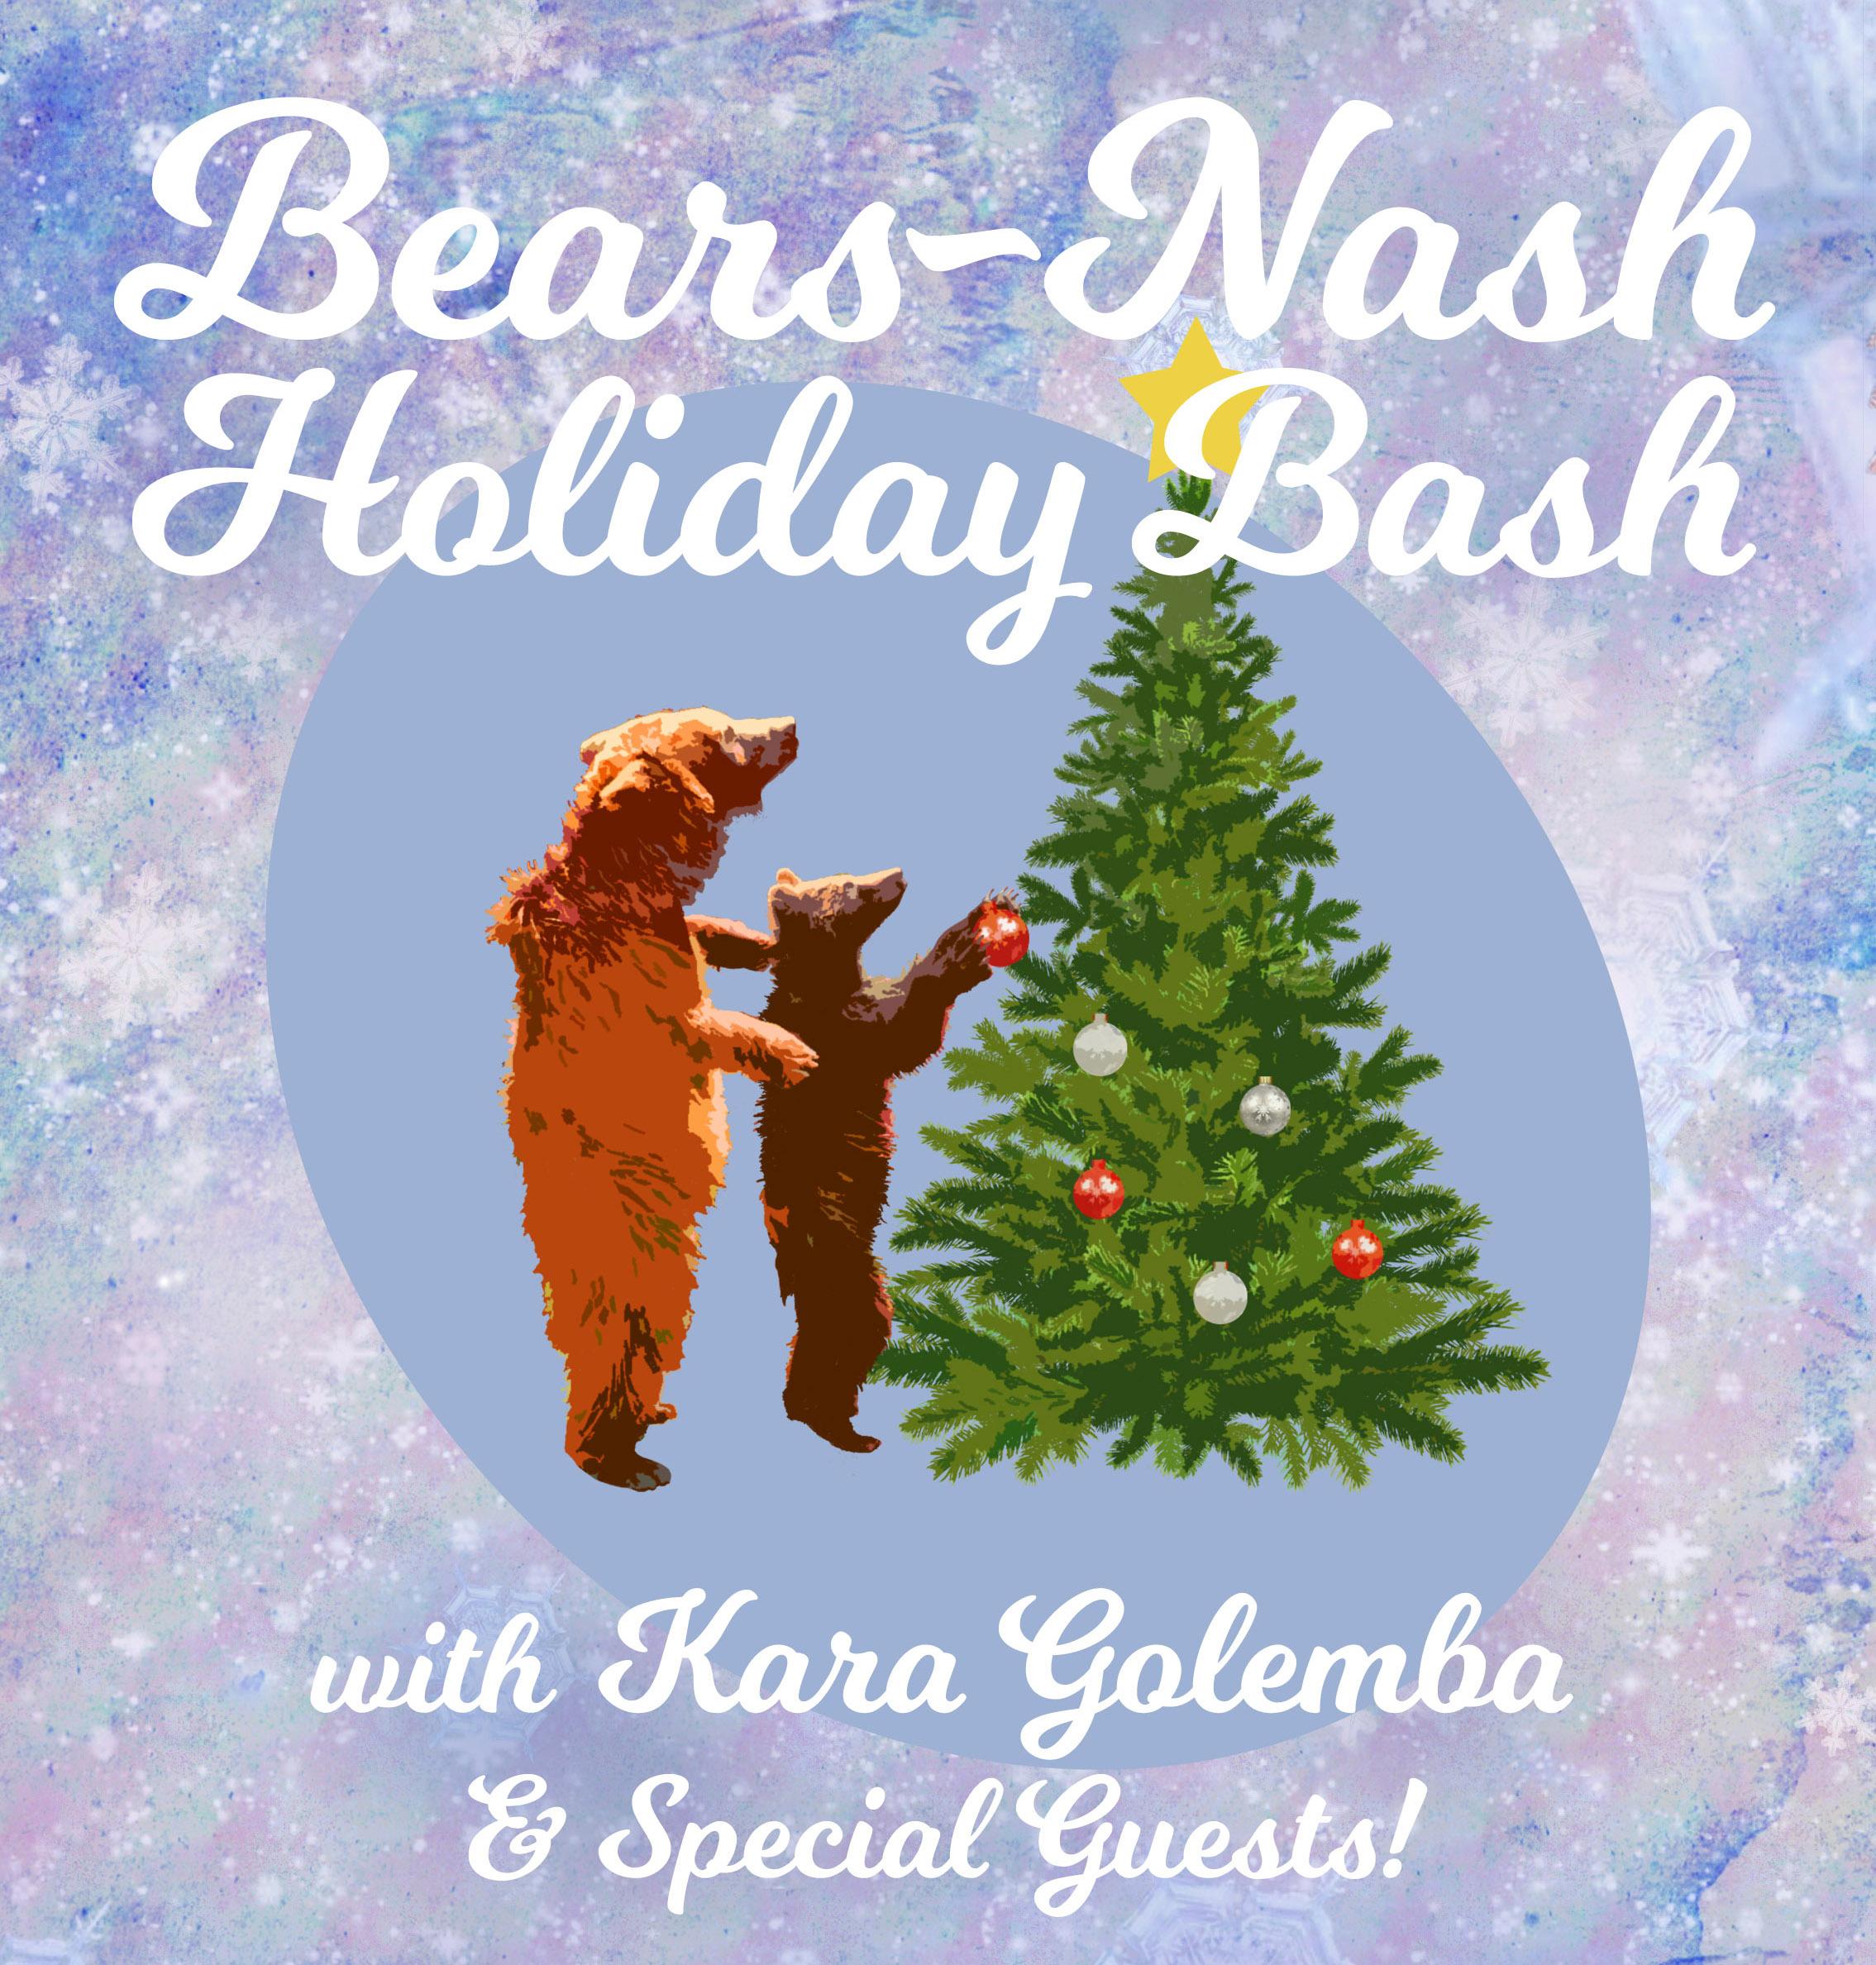 Bears-Nash Holiday Bash 2017